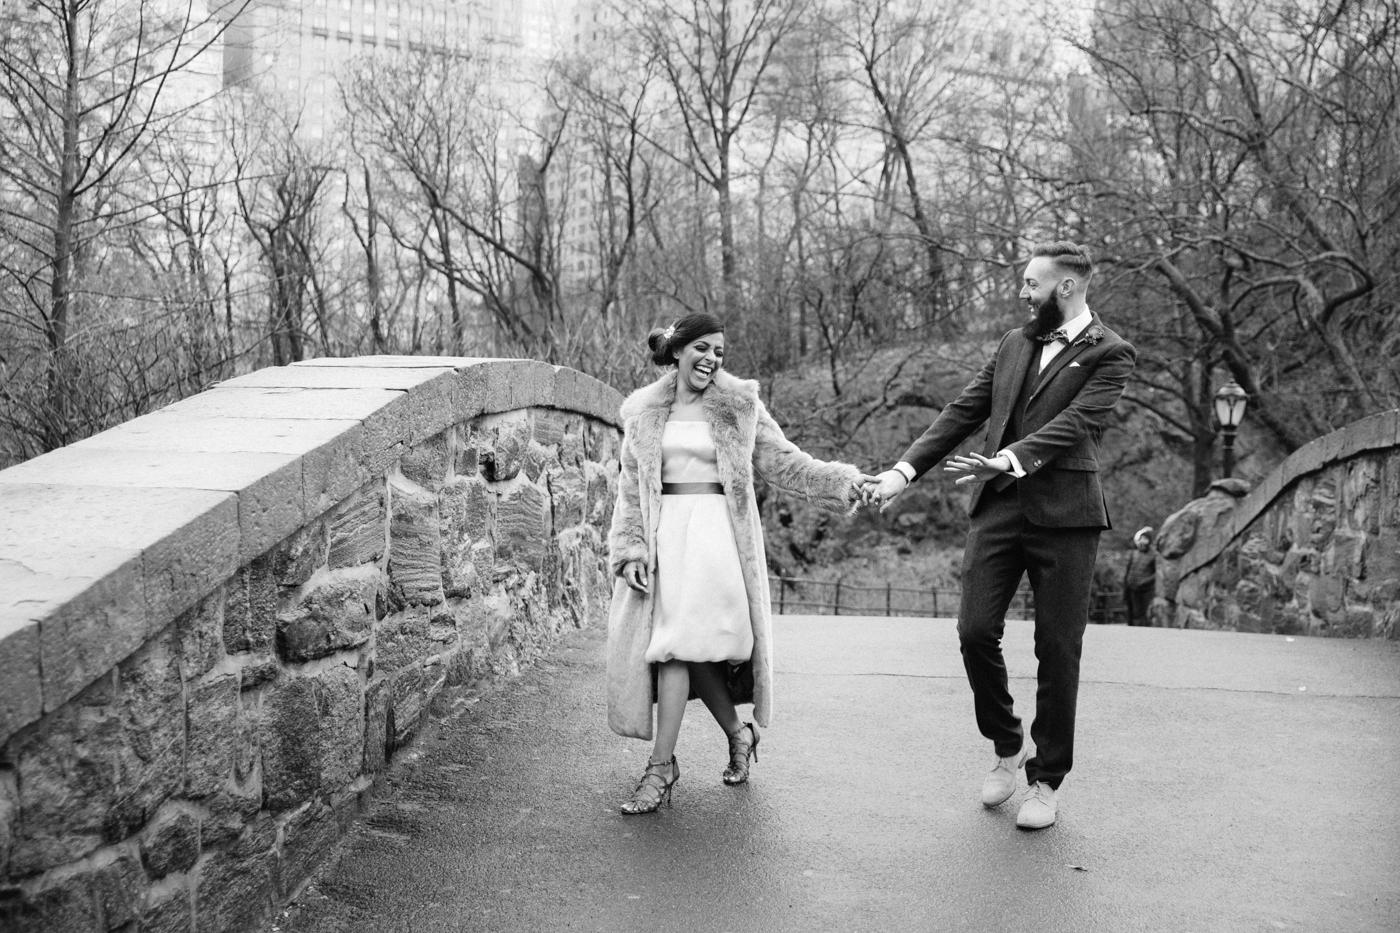 Central-park-wedding-by-Tanya-Isaeva-94.jpg